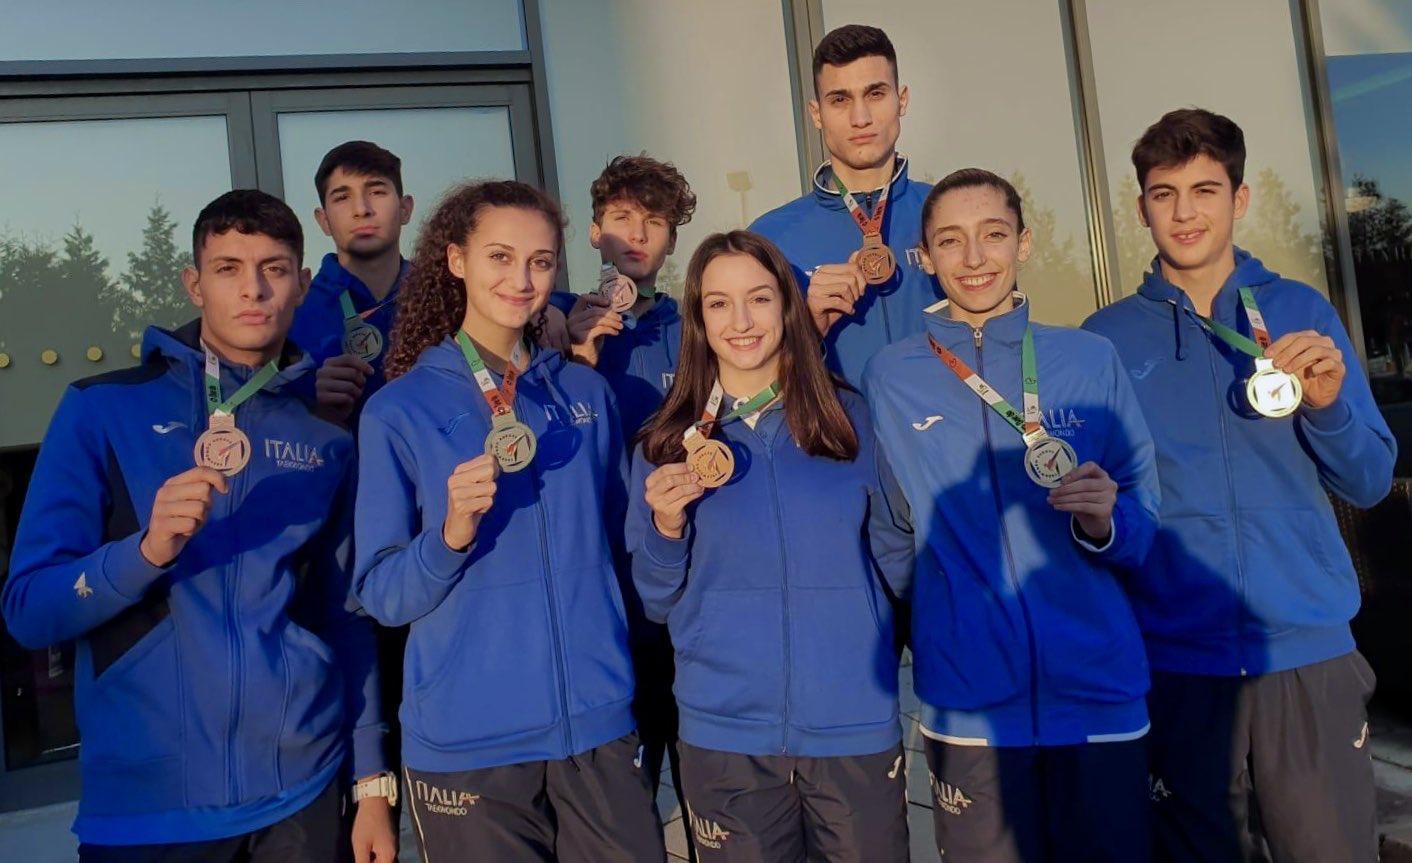 taekwondo europei categorie olimpiche 2019 dublino italia italy 8 medaglie 4 argenti 4 bronzi campionati europei per categorie olimpiche 2019